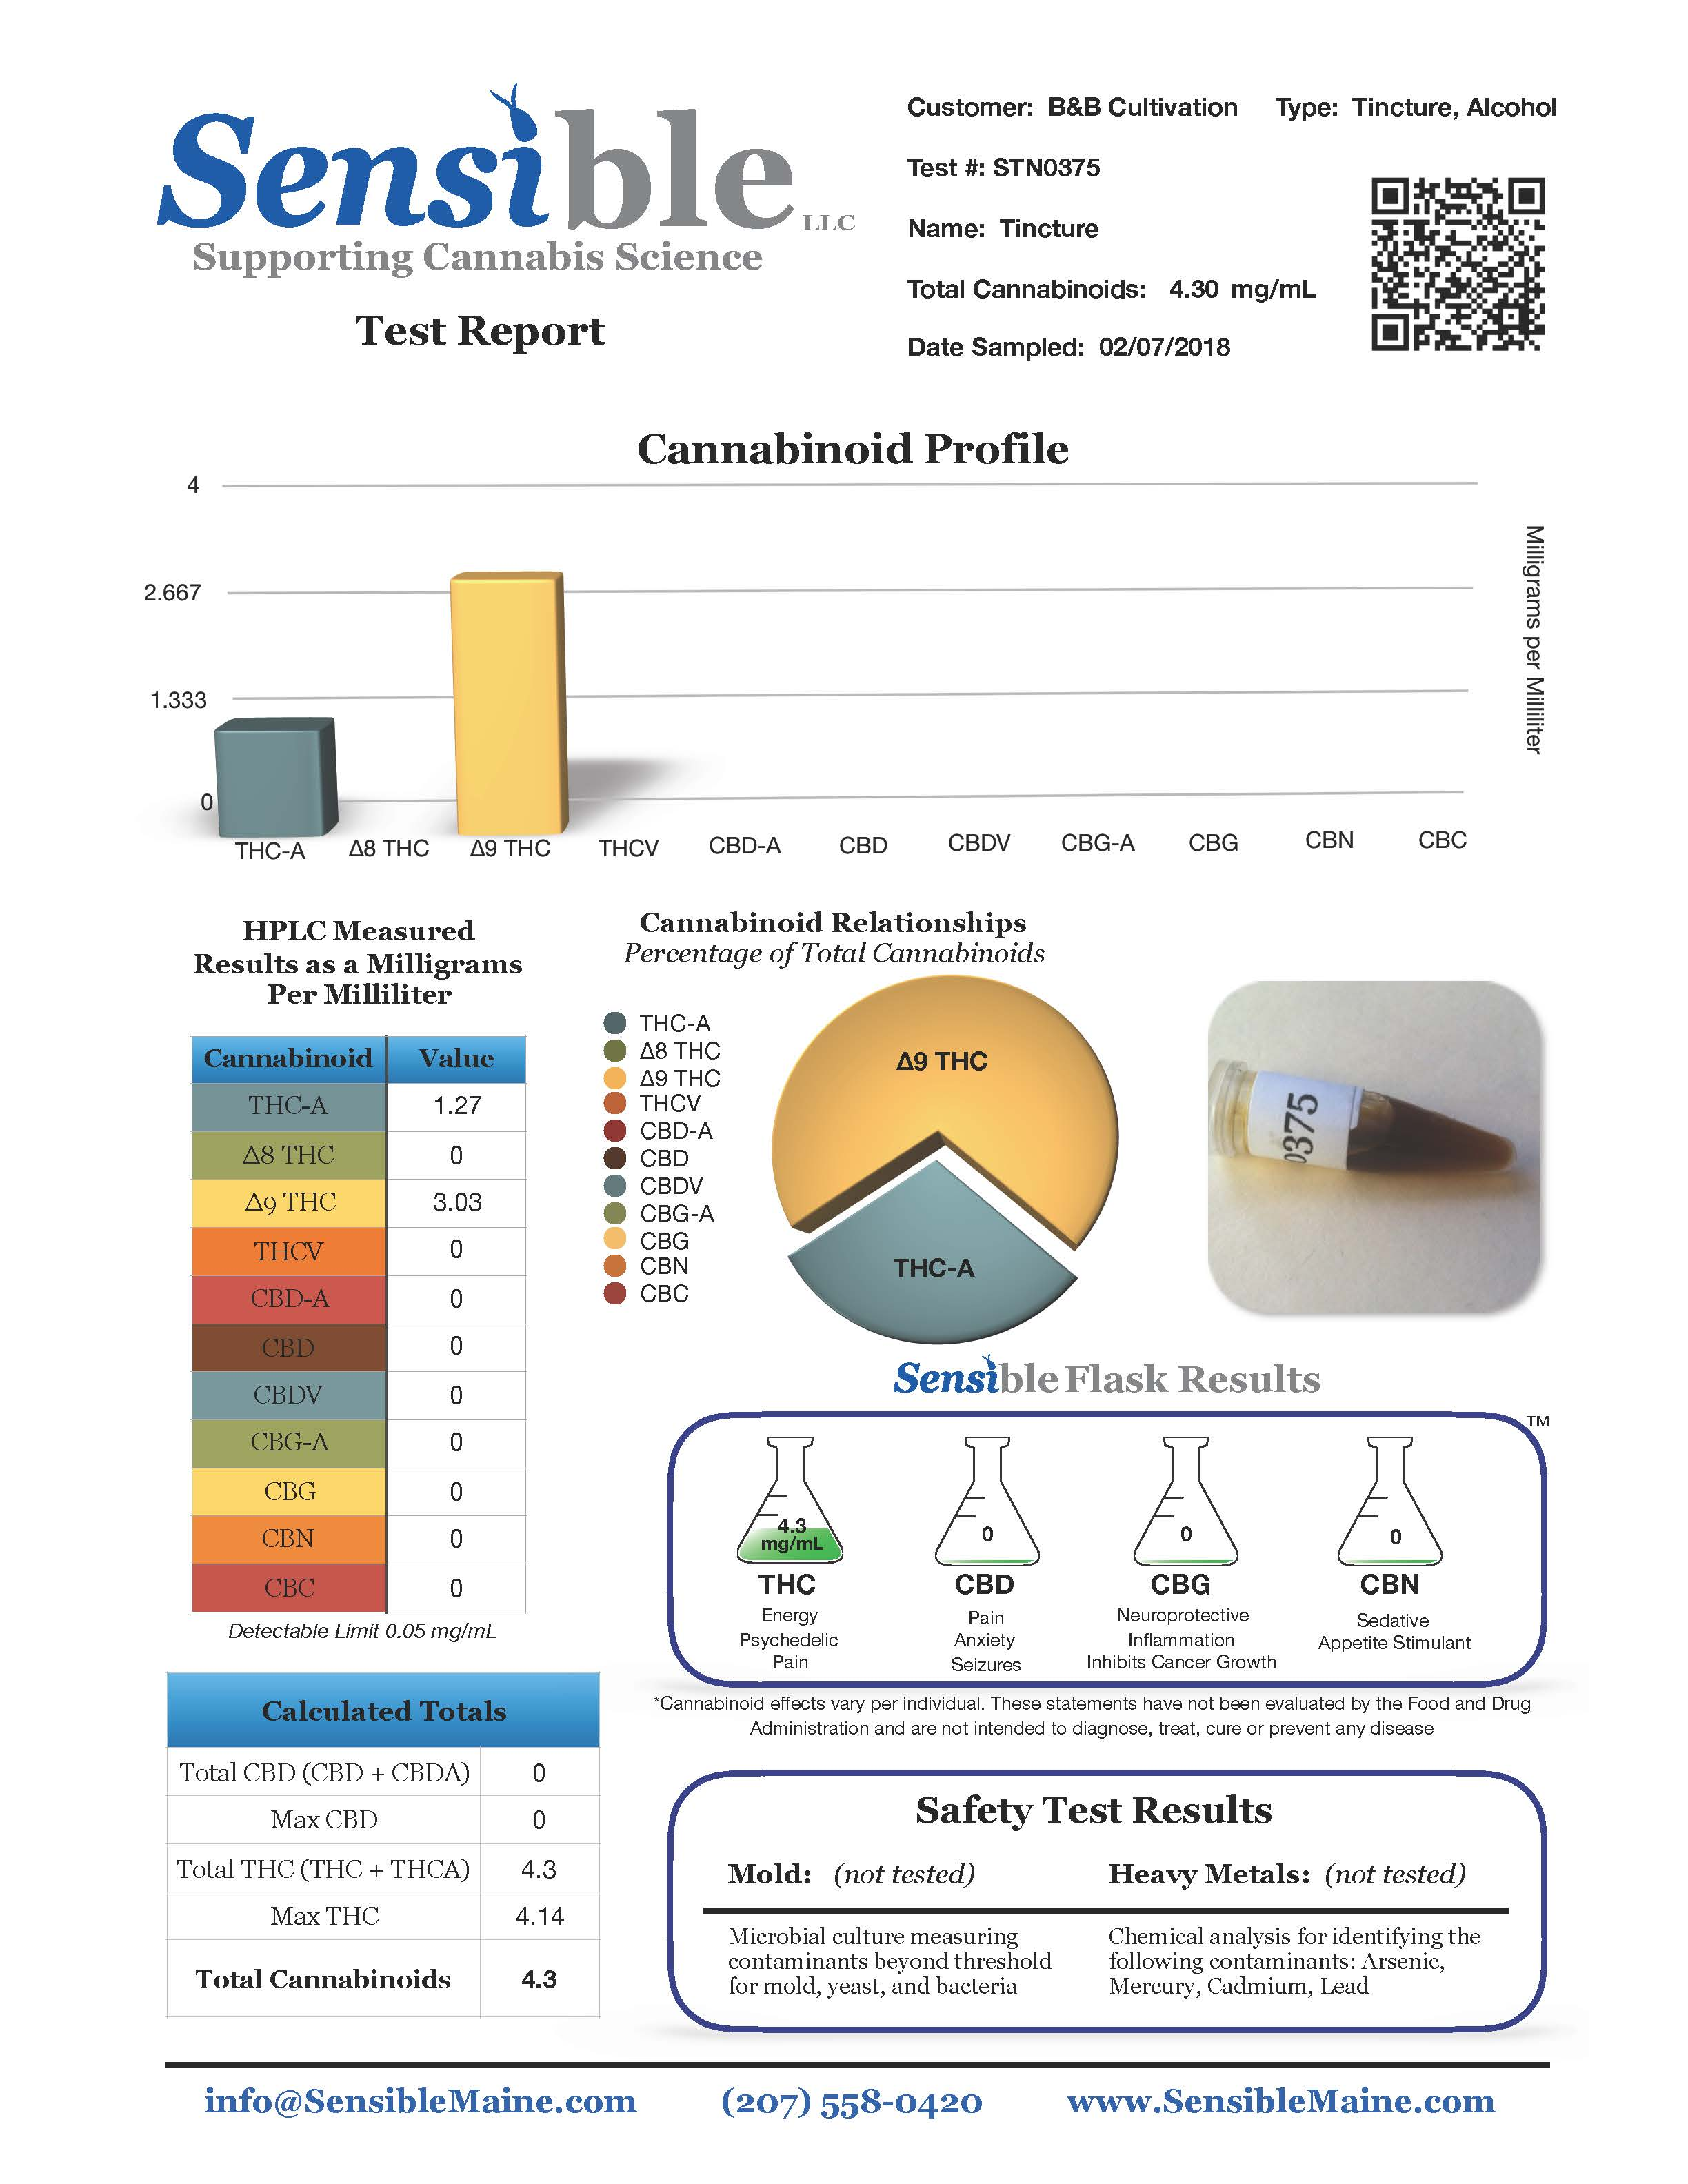 Test Report stn0375.jpg